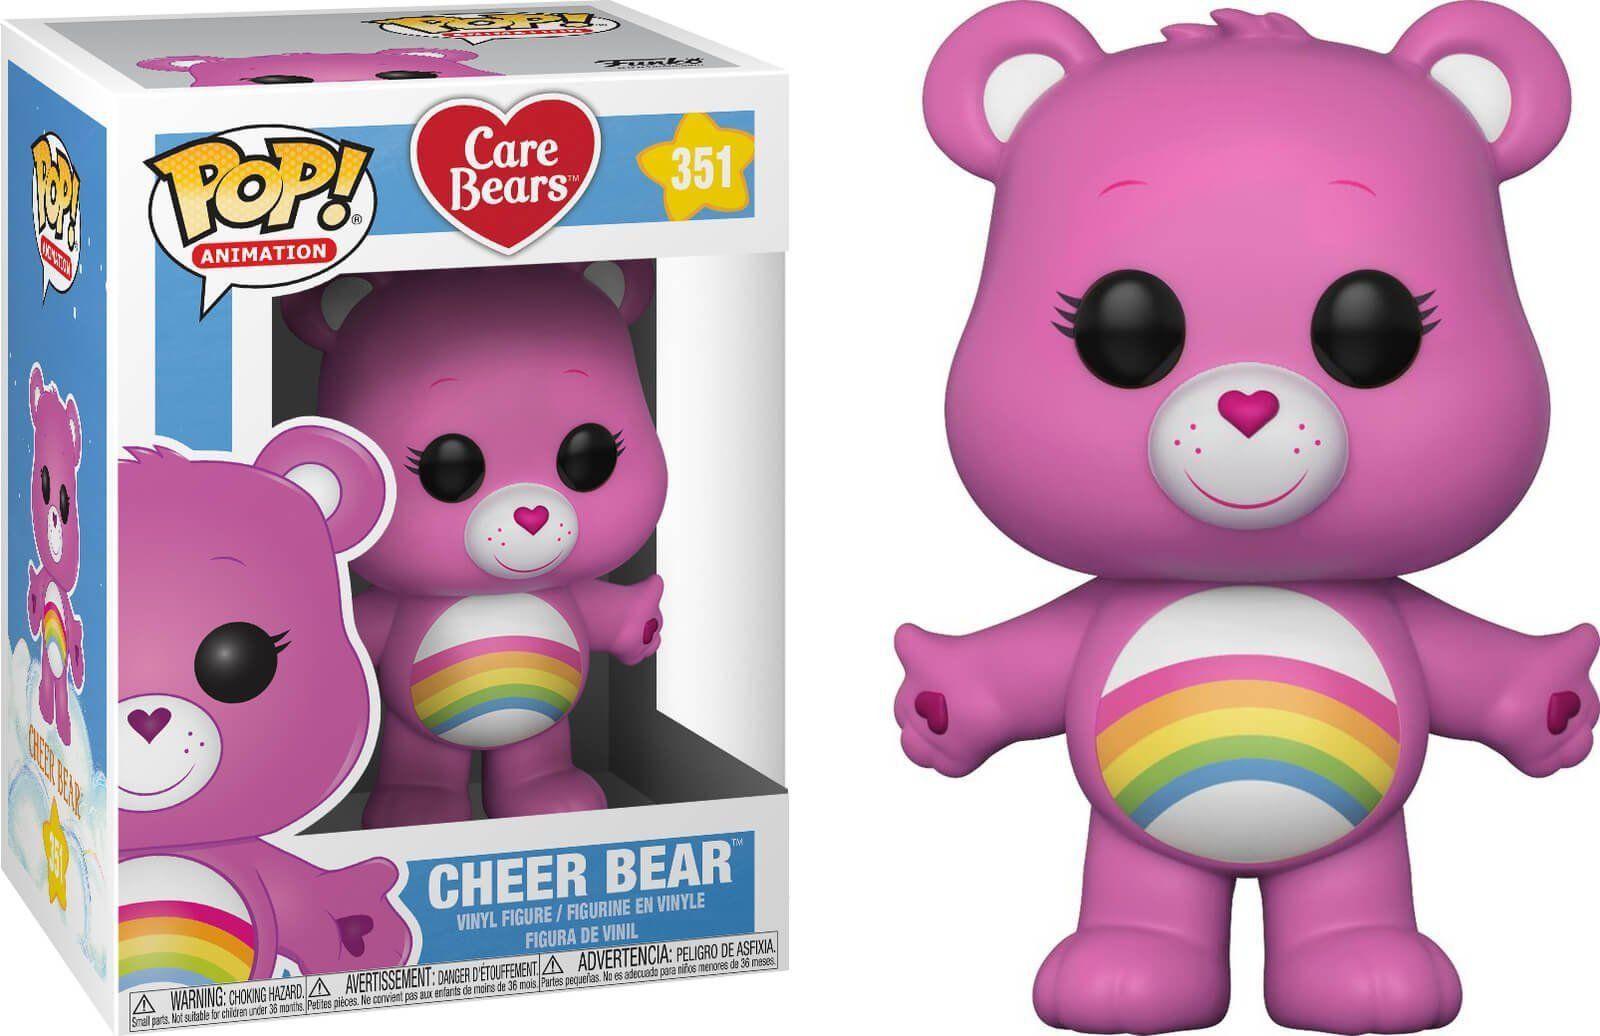 Funko Pop! Cheer Bear: Care Bears #351 - Funko